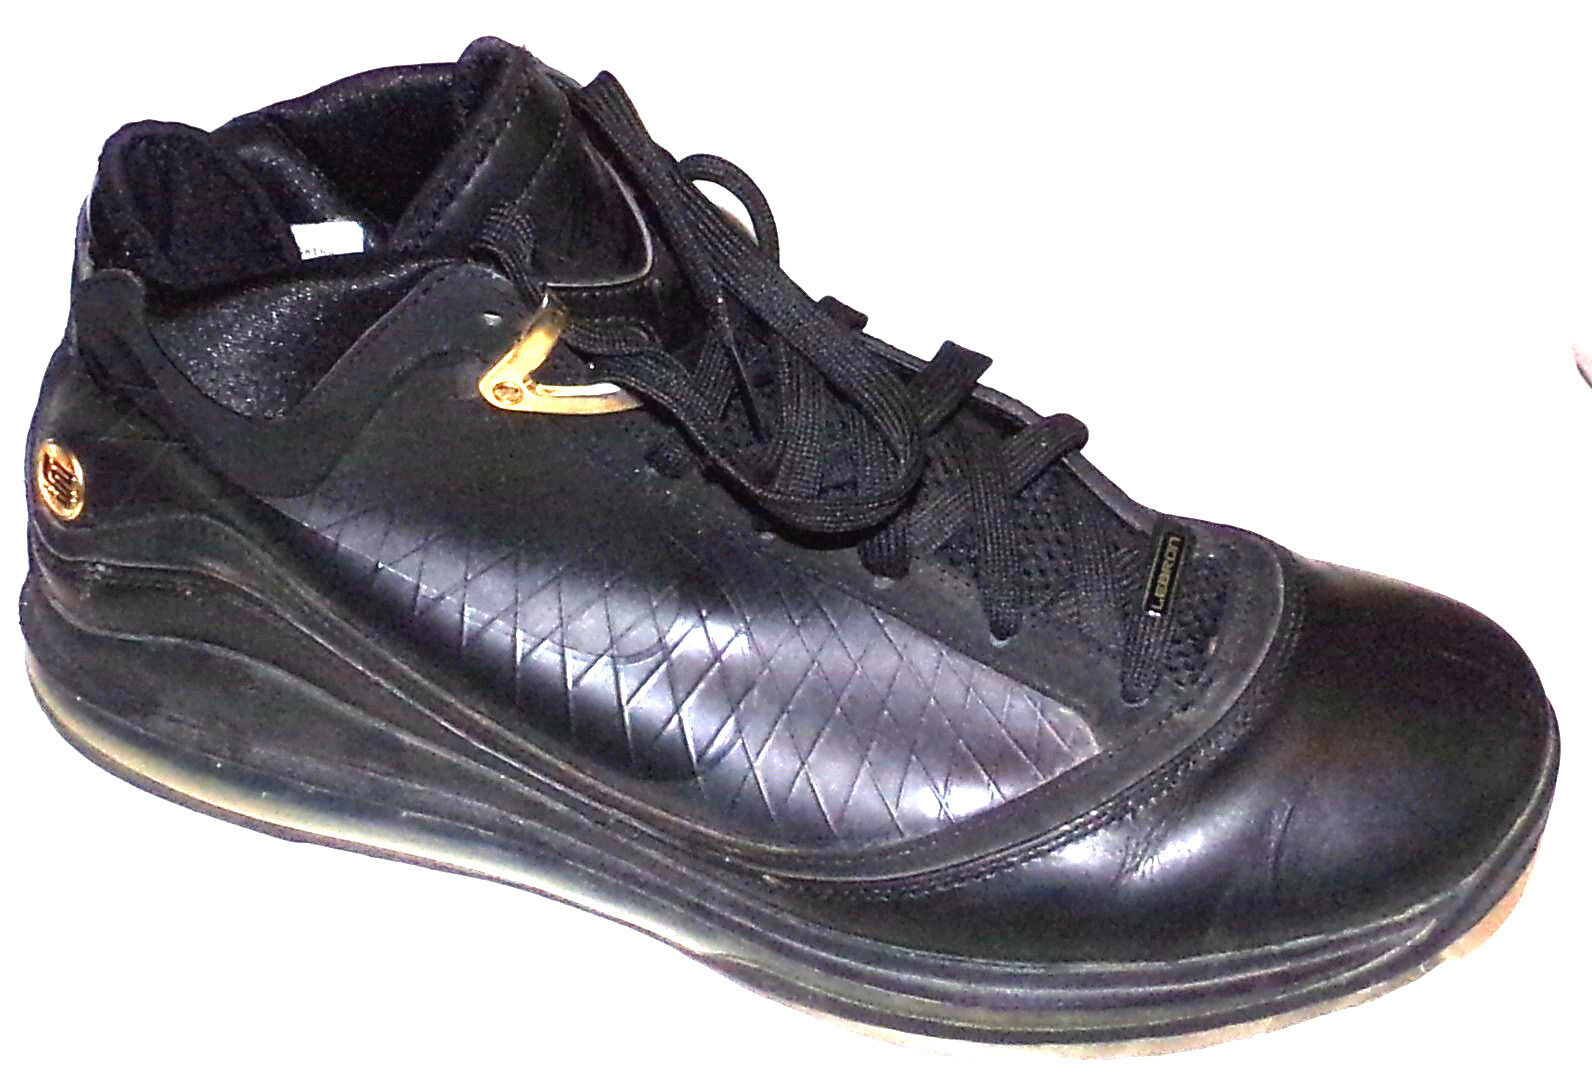 NIKE LEBRON JAMES VII ( 7 ) DUNKMAN ALLSTAR BASKETBALL SHOES IN BLACK SIZE-14